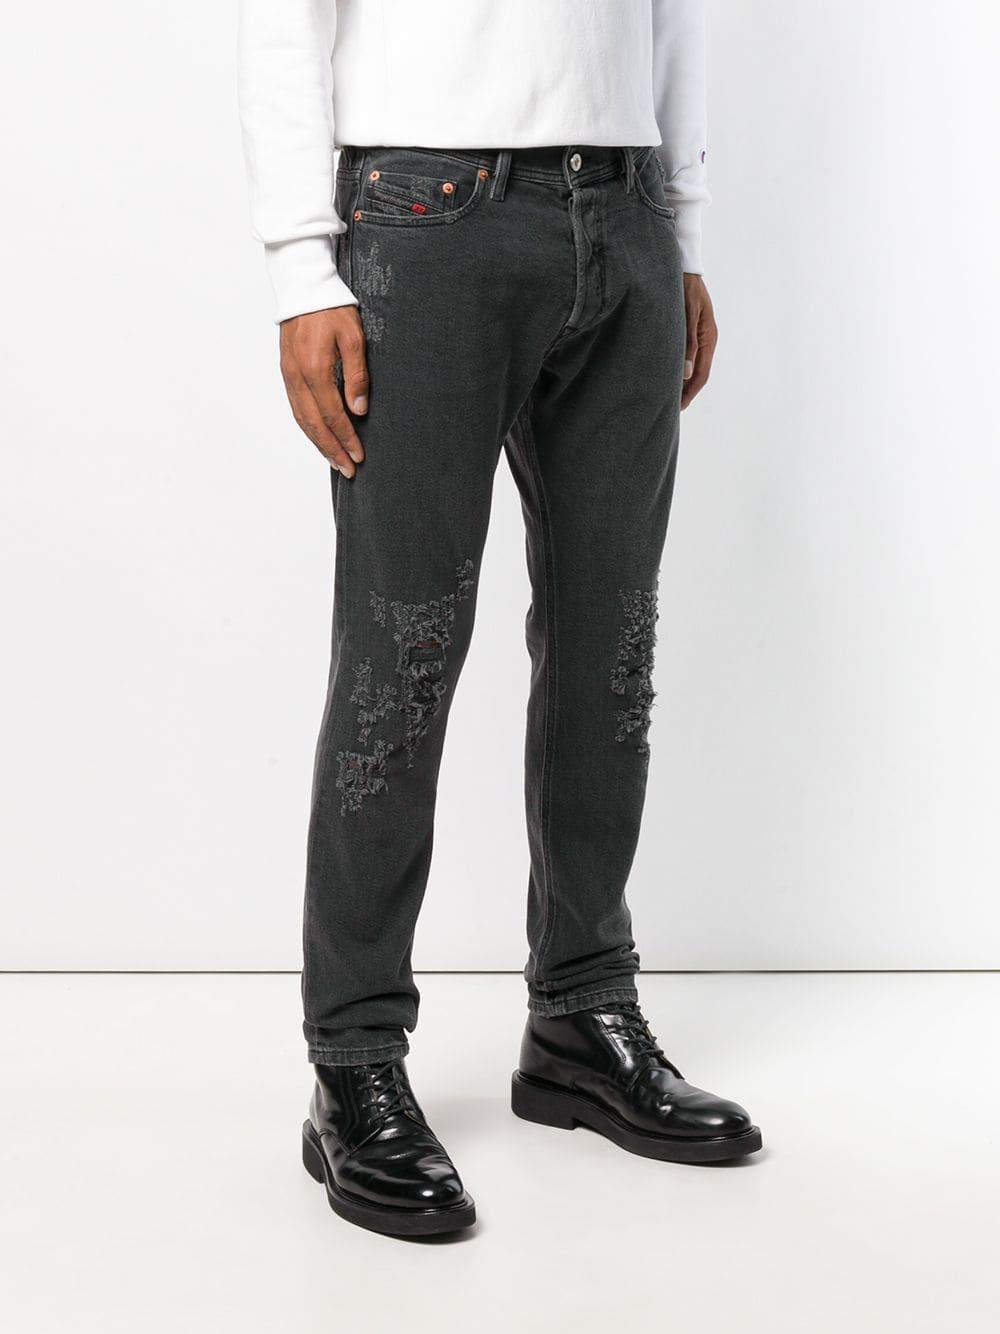 64ac8a0493e969 Lyst - DIESEL Tepphar 085aj Jeans in Black for Men